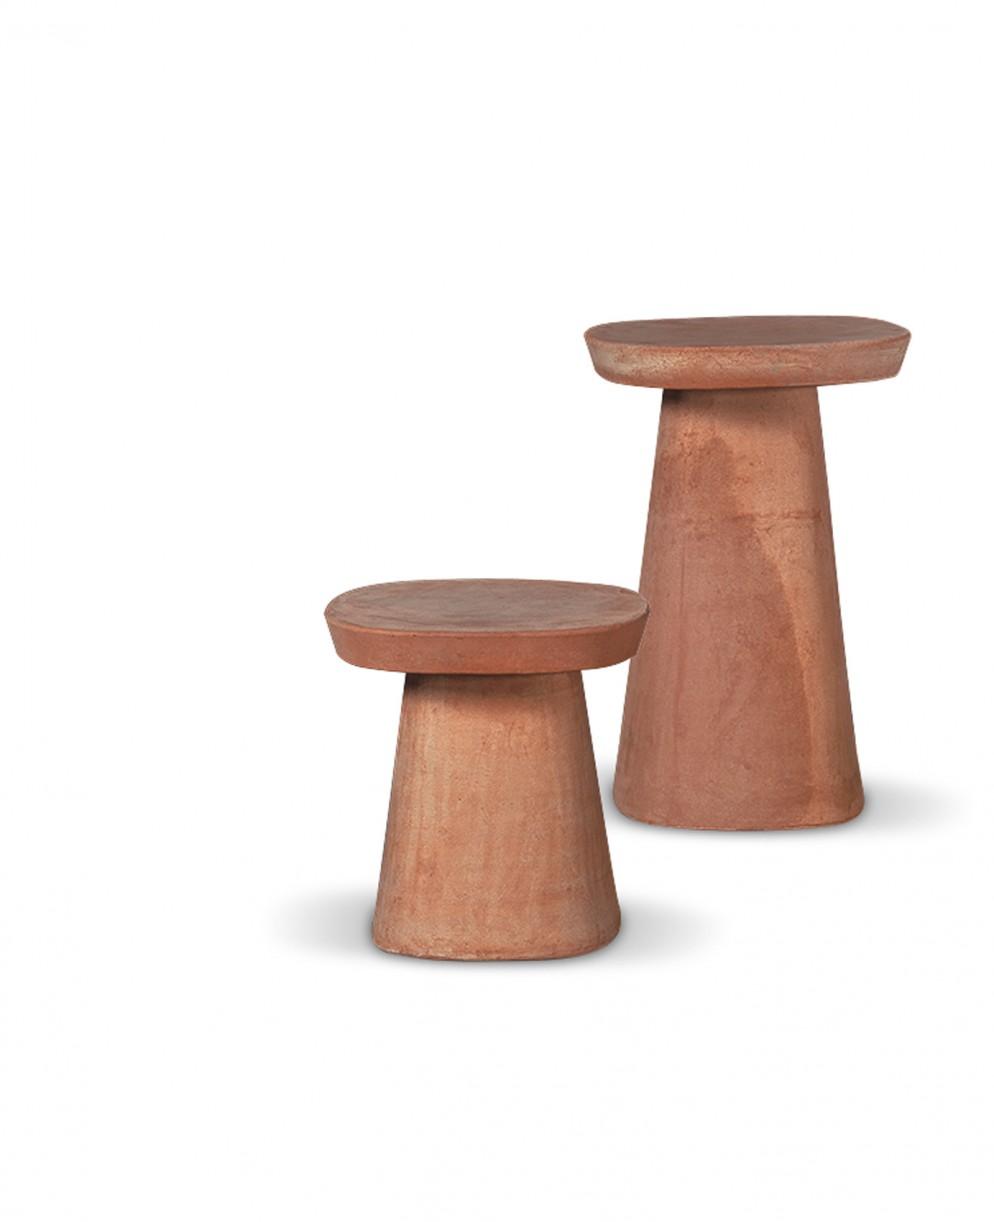 ceramica-di-design-02